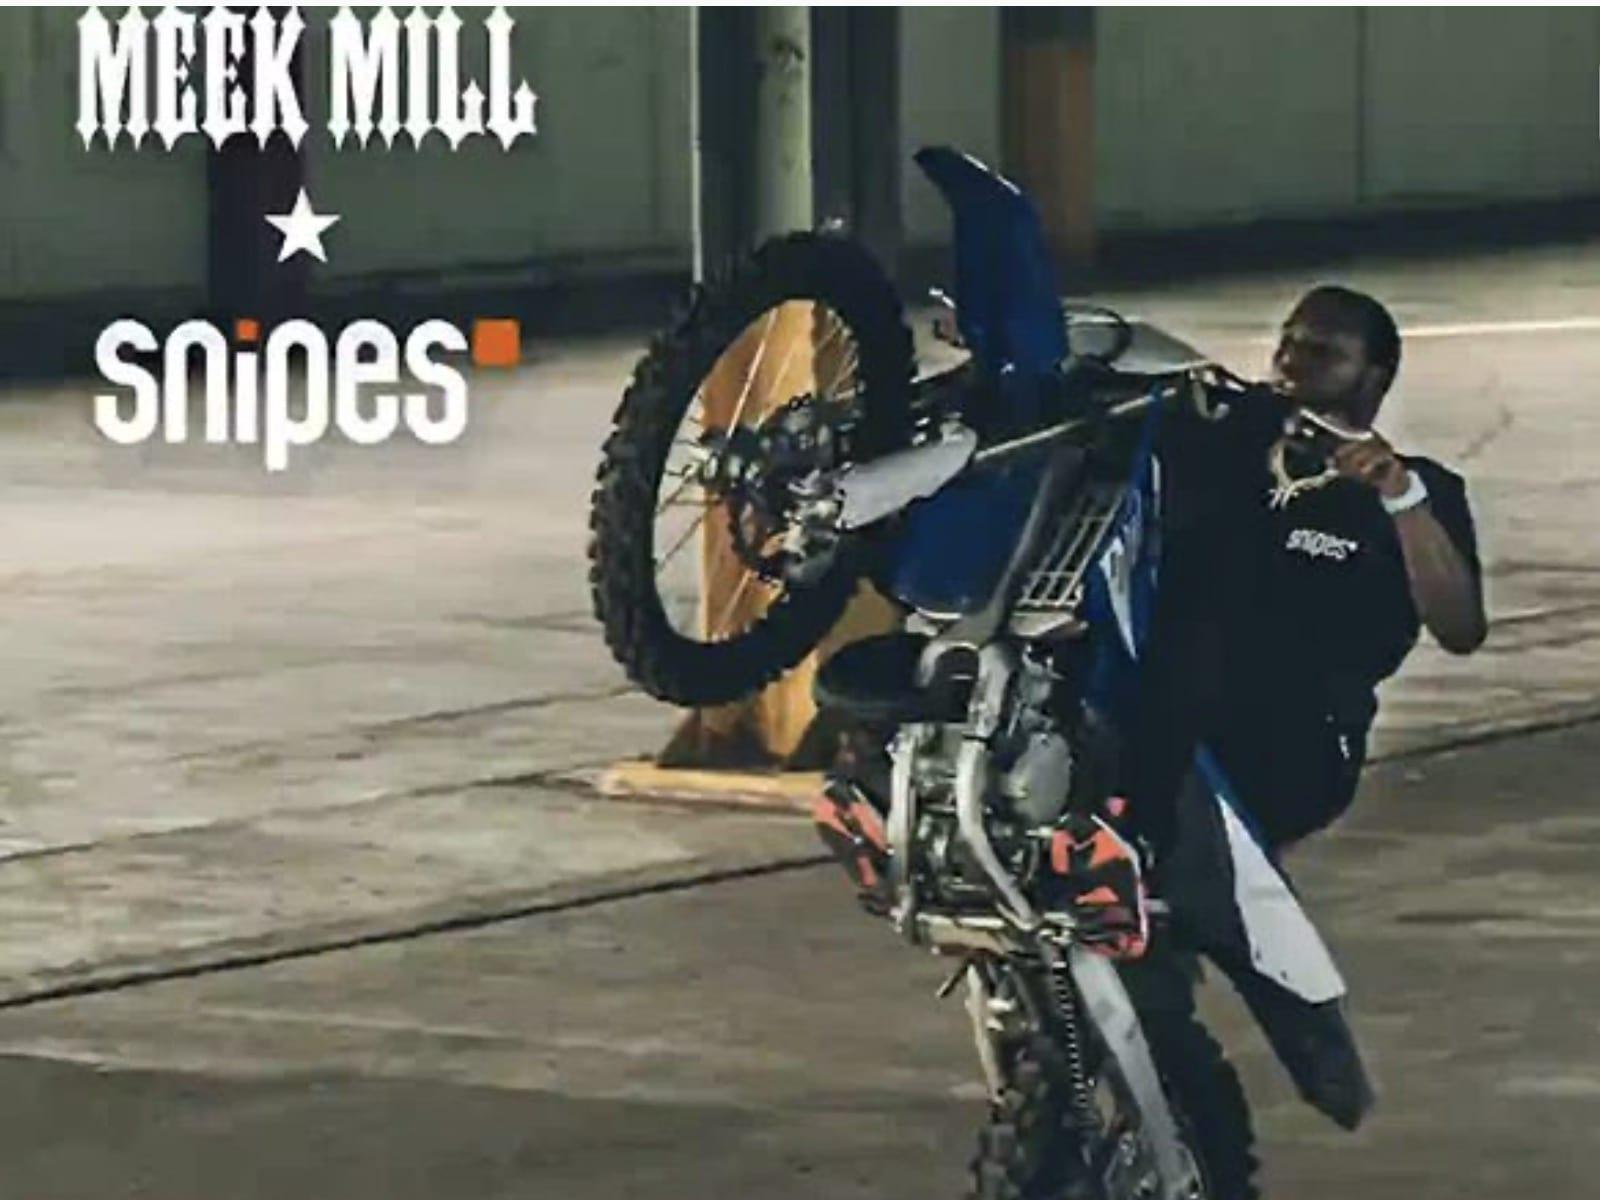 Meek Mill Snipes